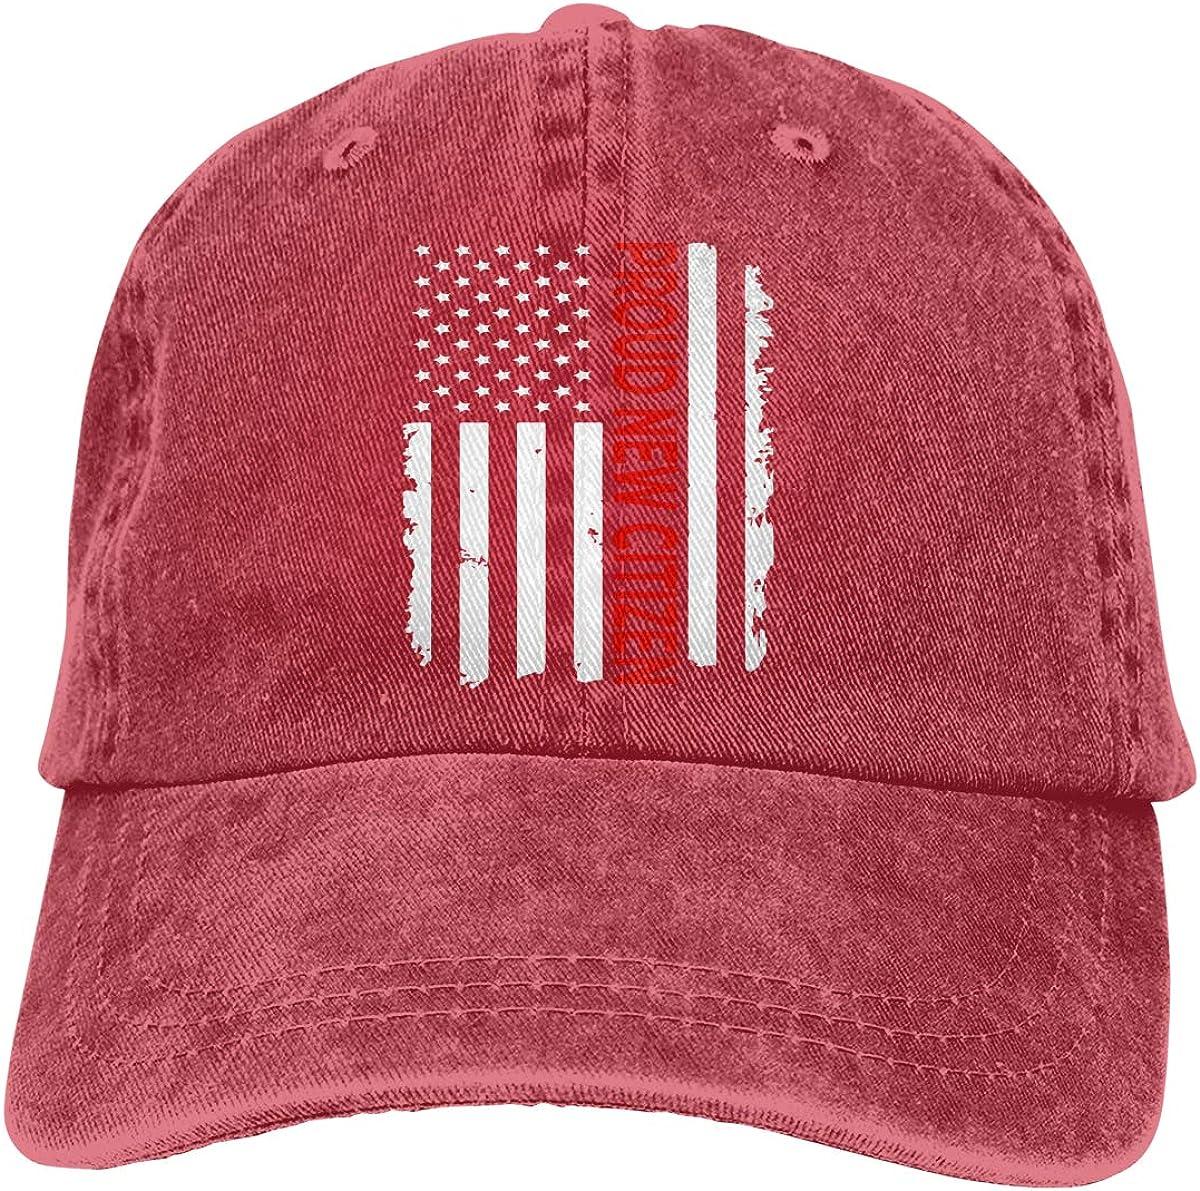 Adult Fashion Cotton Denim Baseball Cap Proud New American Citizen Classic Dad Hat Adjustable Plain Cap